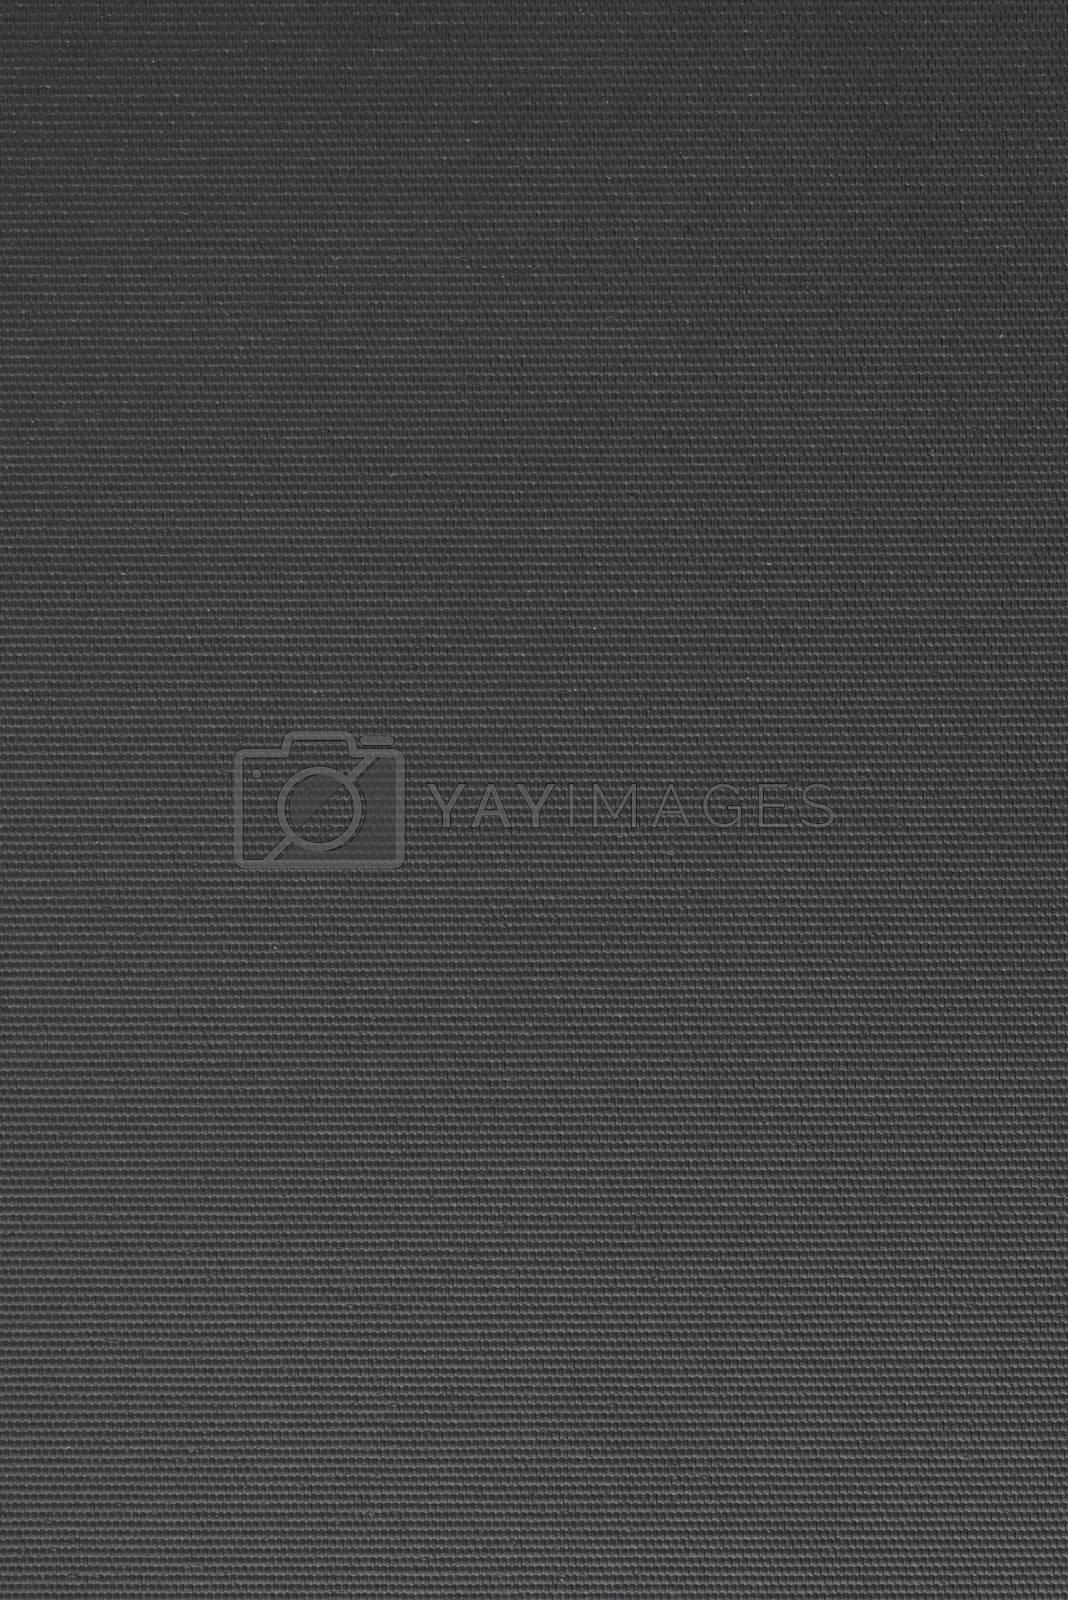 Royalty free image of Grey vinyl texture by homydesign